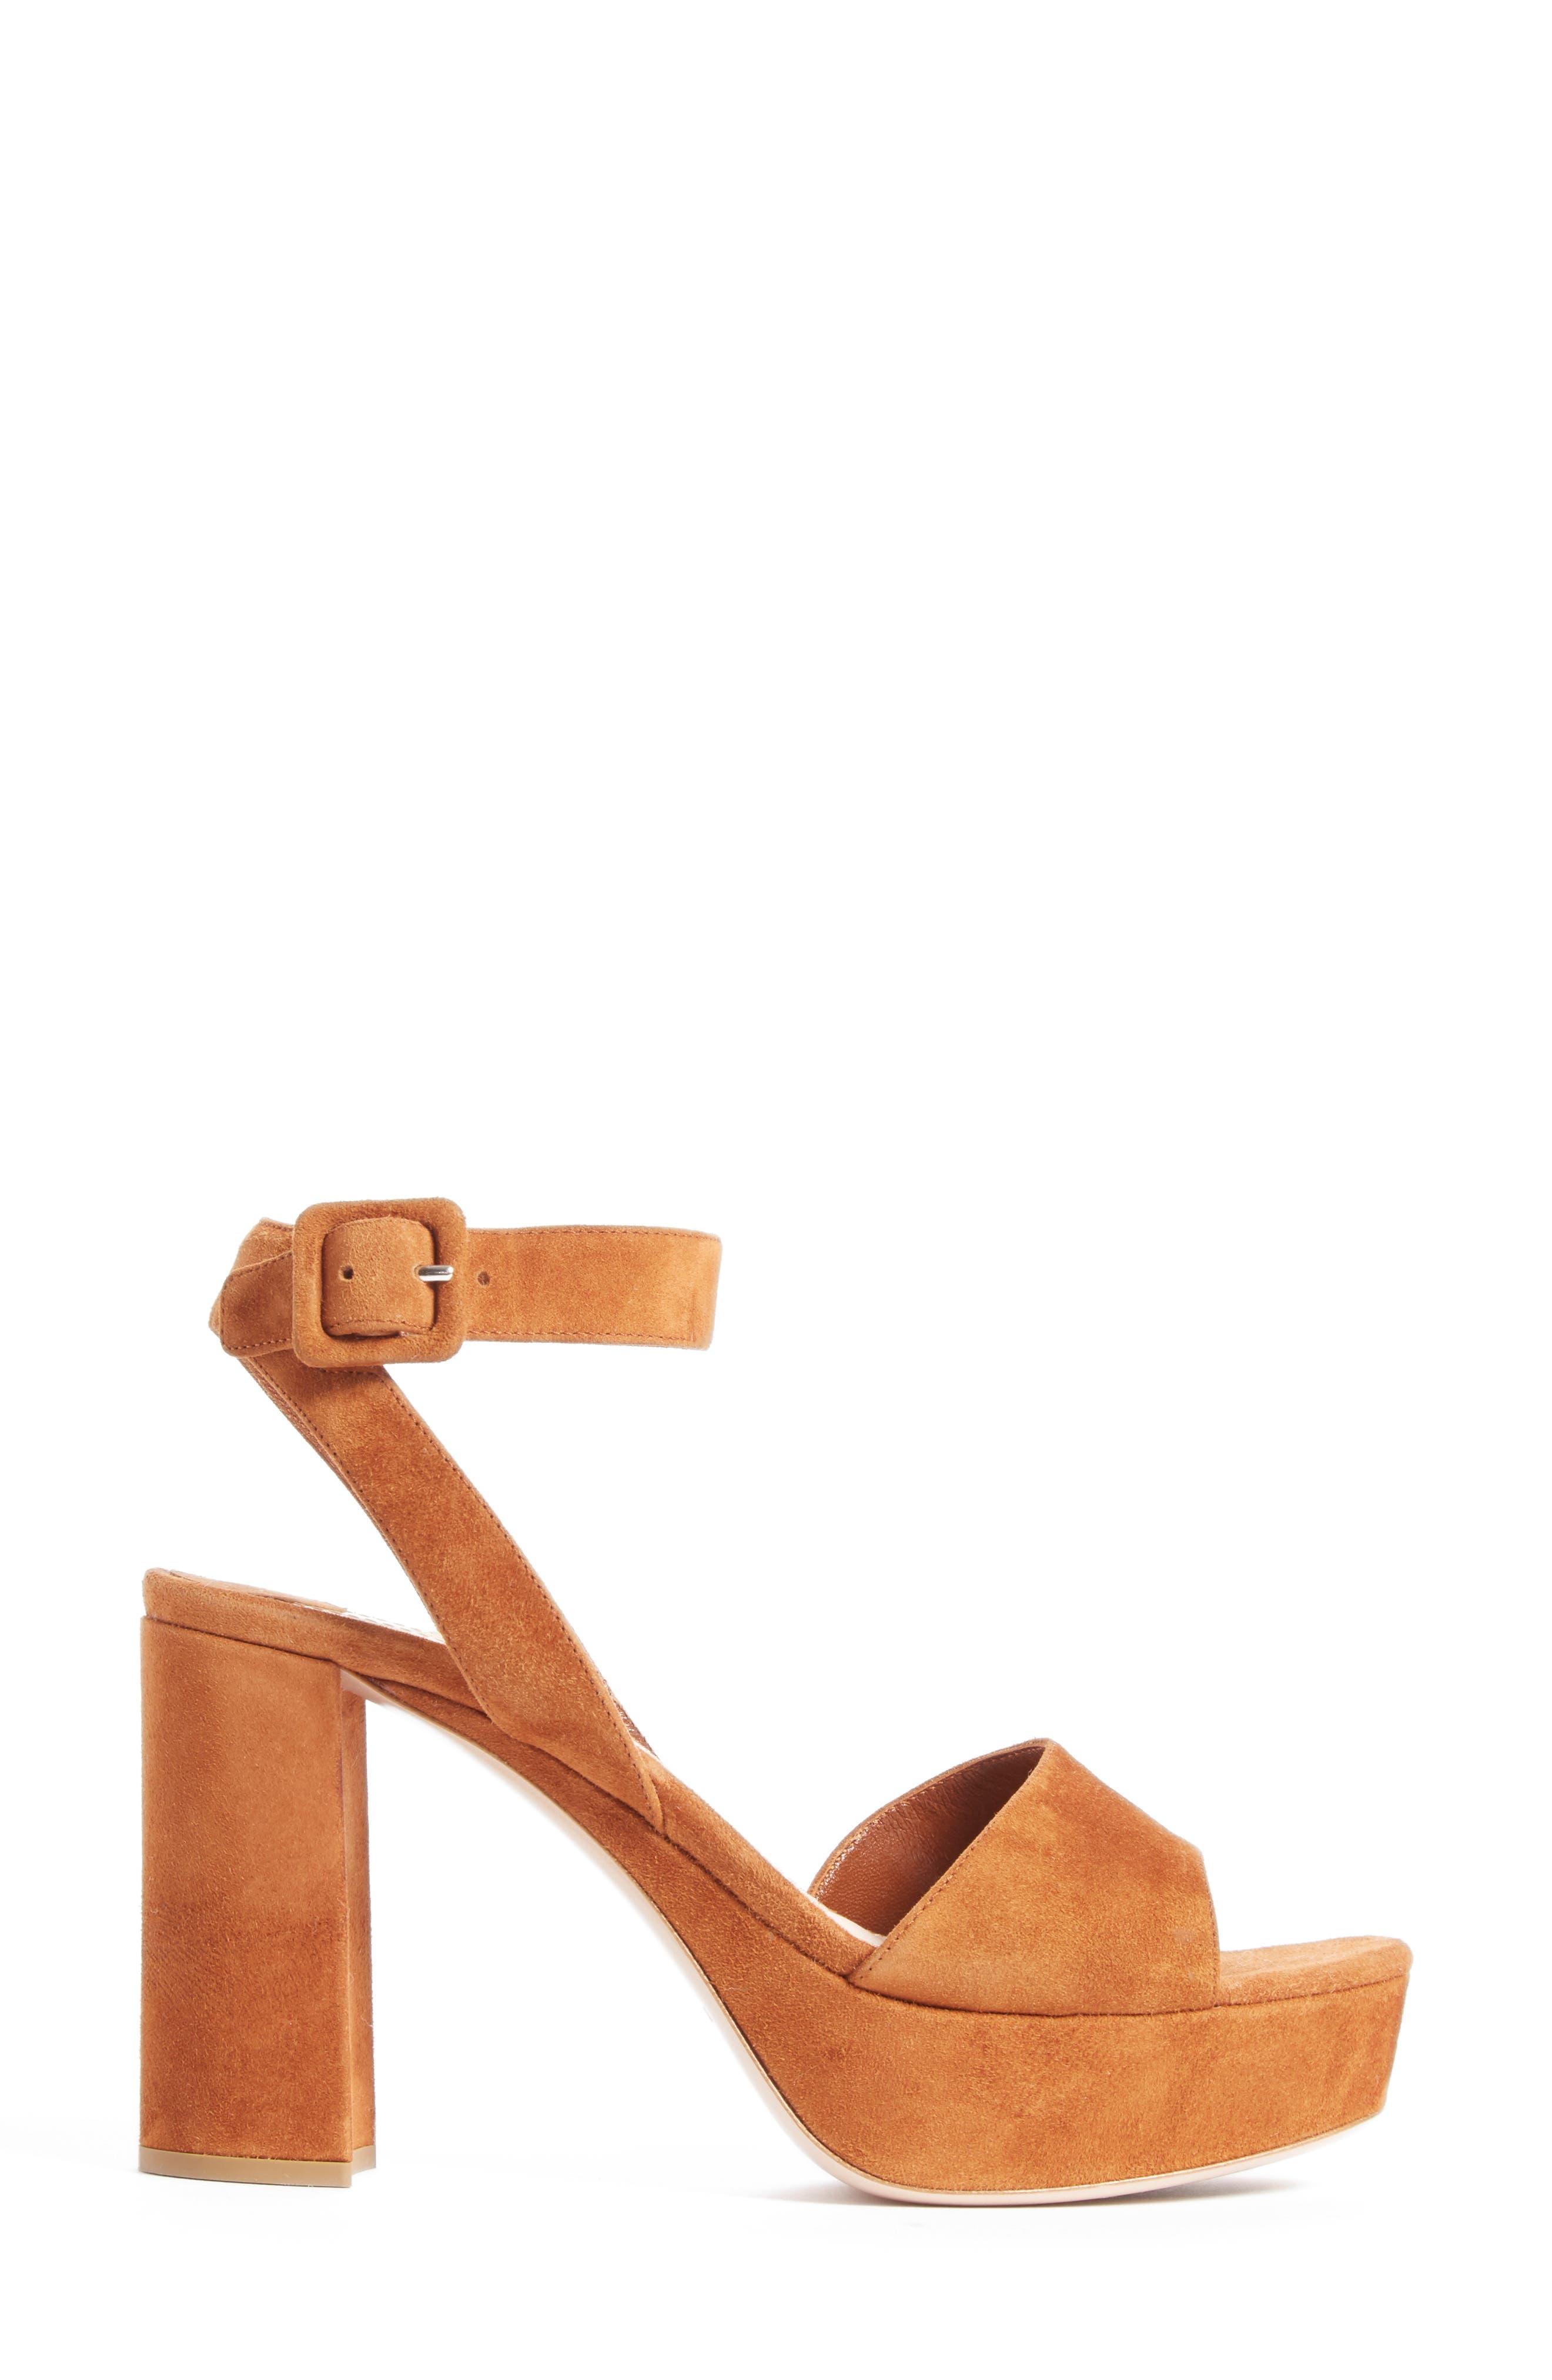 MIU MIU, 'Sandali' Ankle Strap Sandal, Alternate thumbnail 2, color, 200